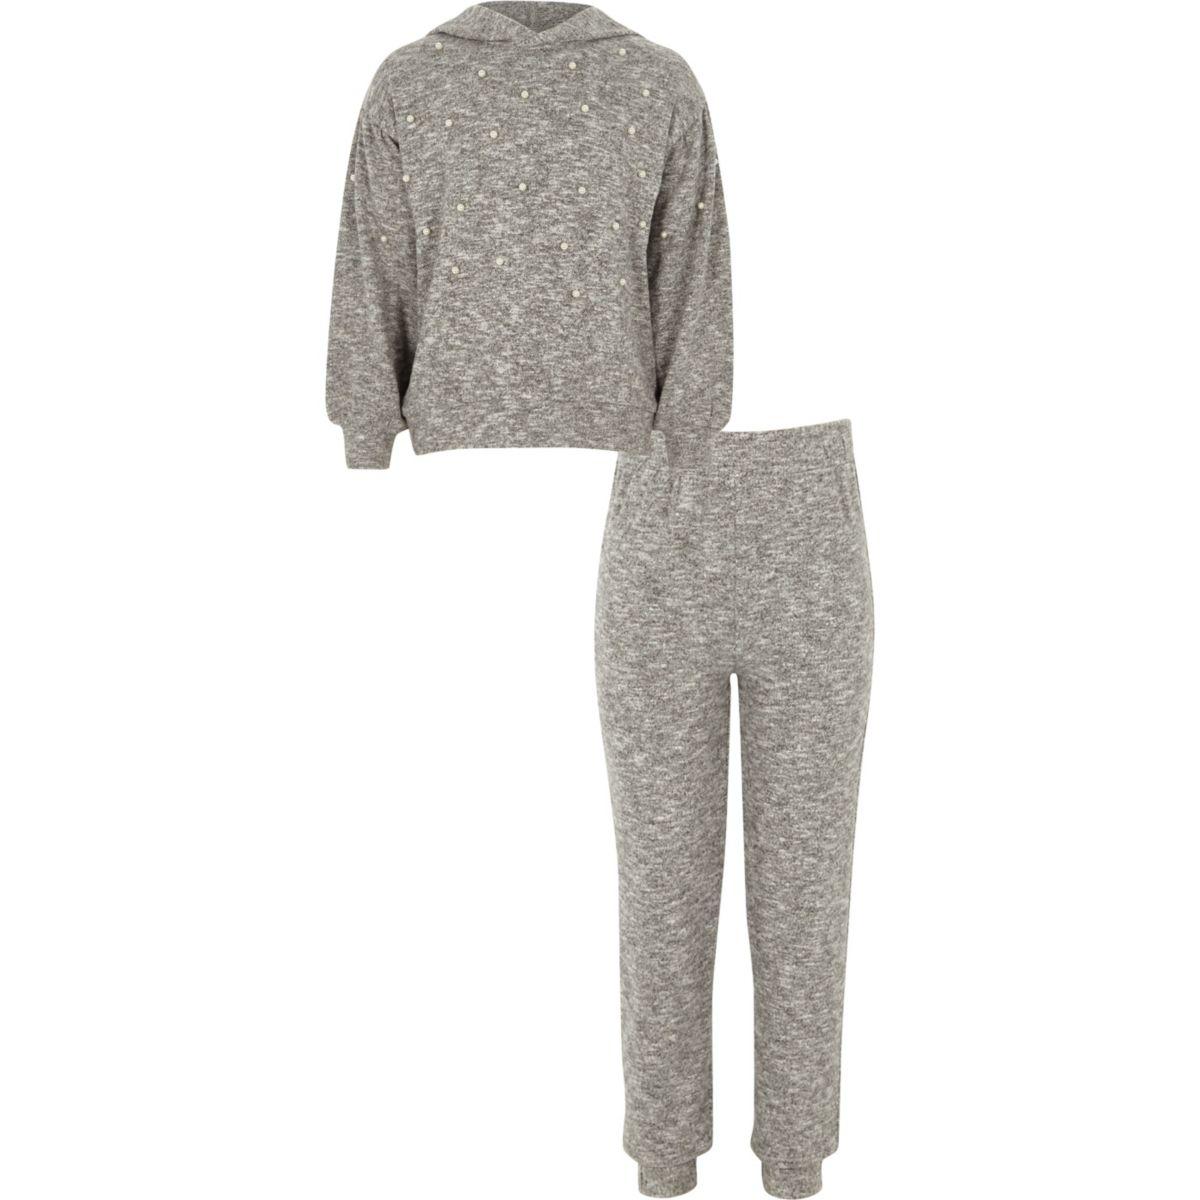 Girls grey pearl embellished hoodie outfit